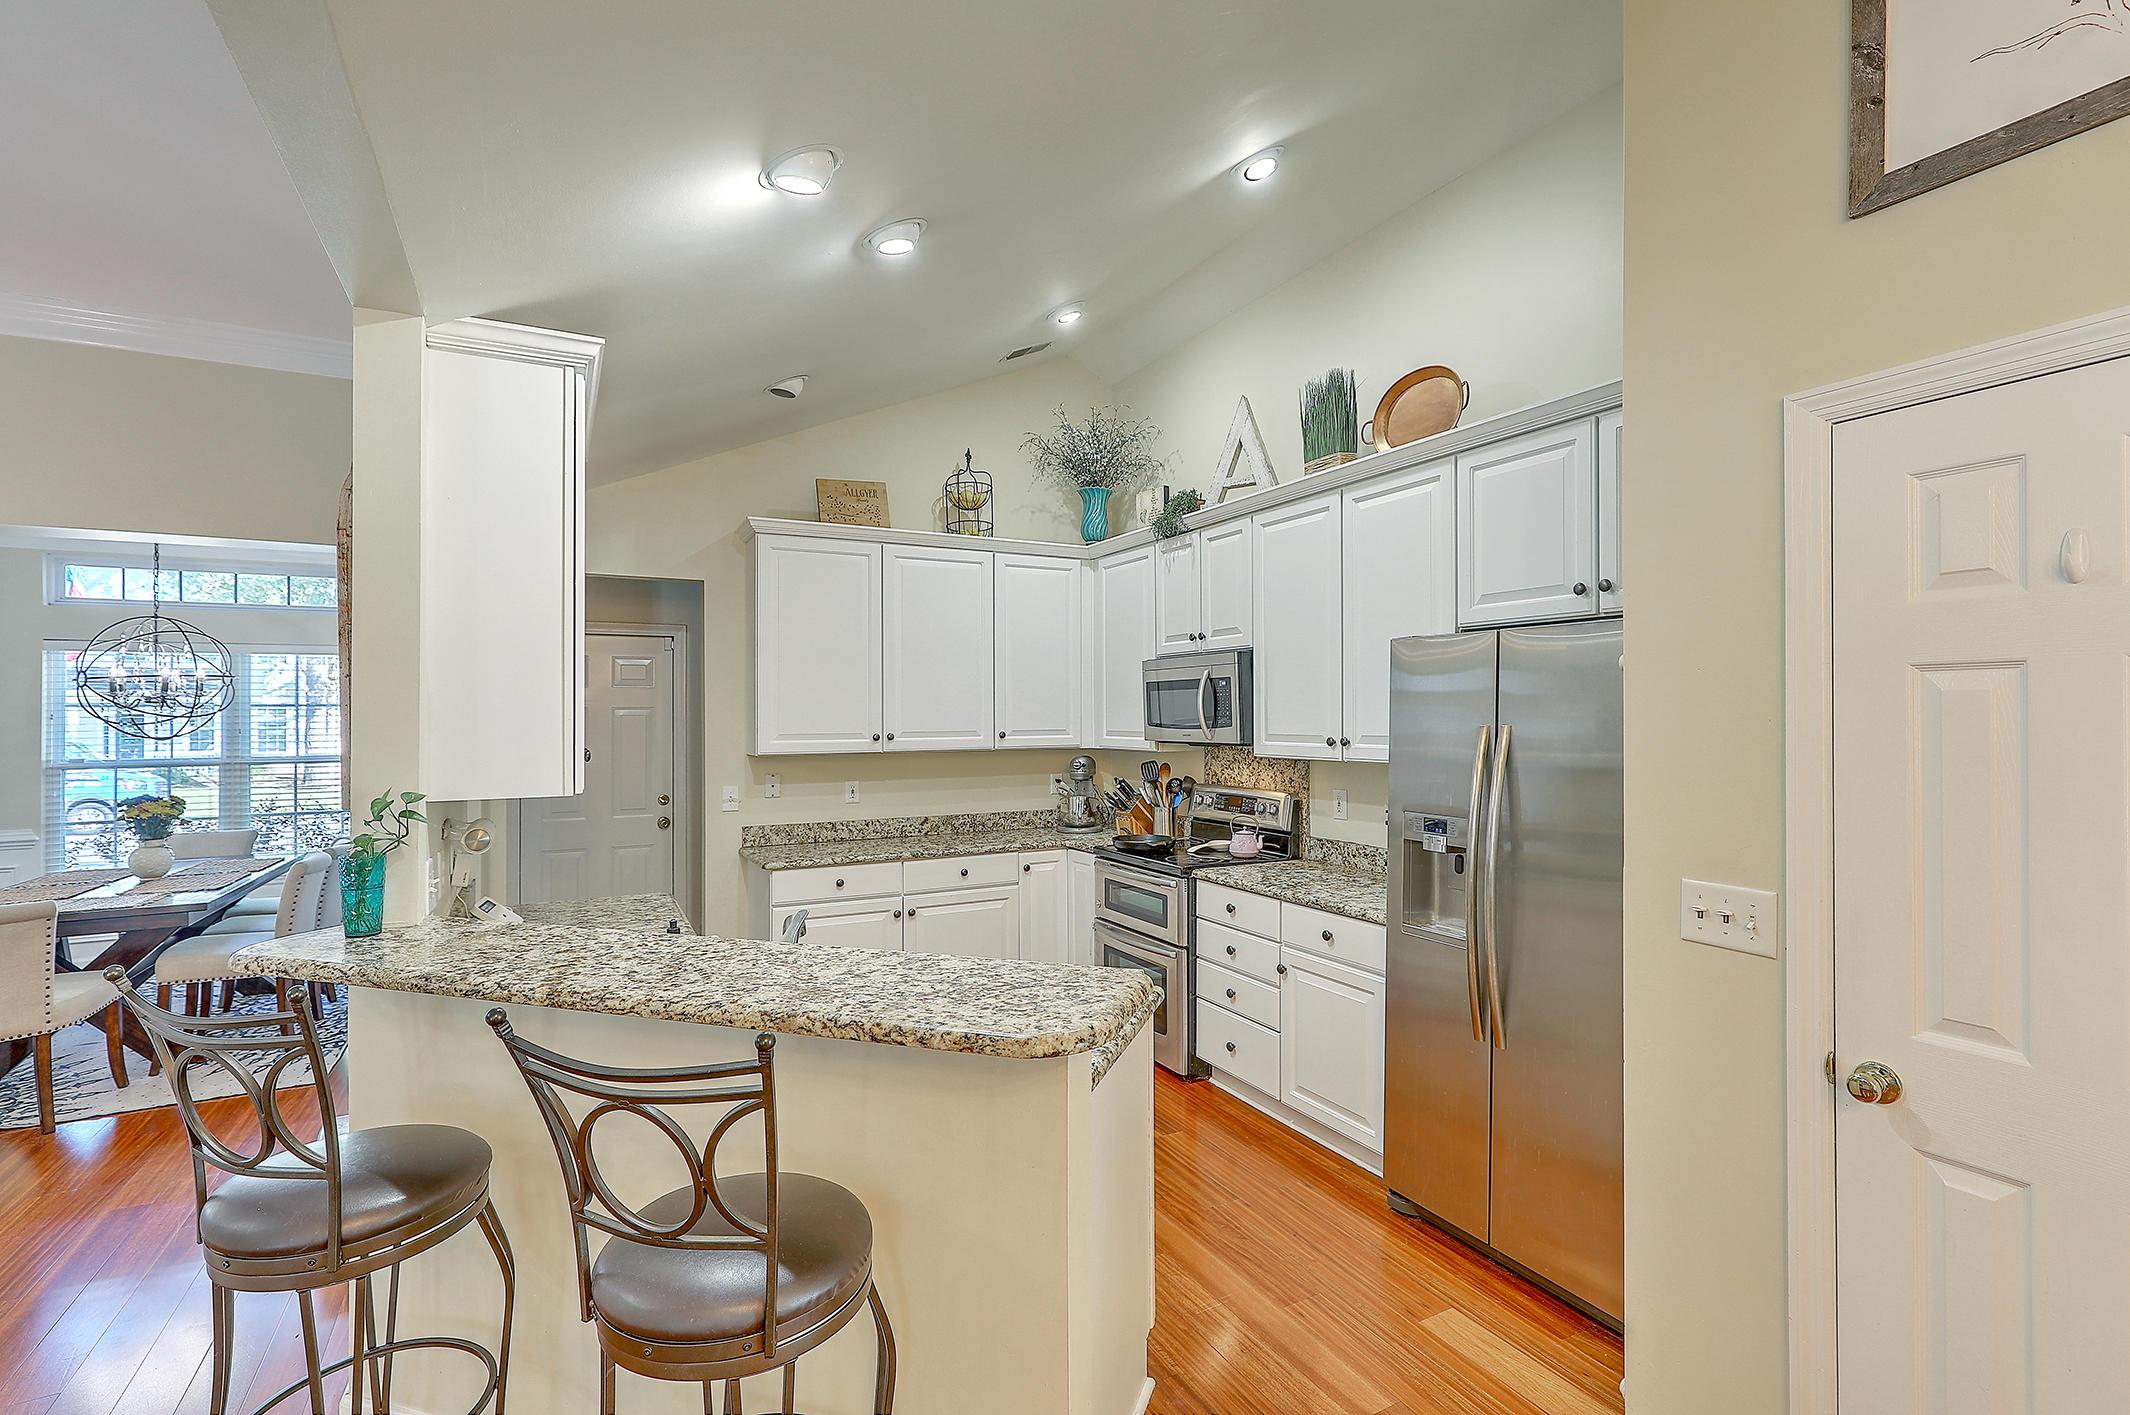 Dunes West Homes For Sale - 1471 Cypress Pointe, Mount Pleasant, SC - 31